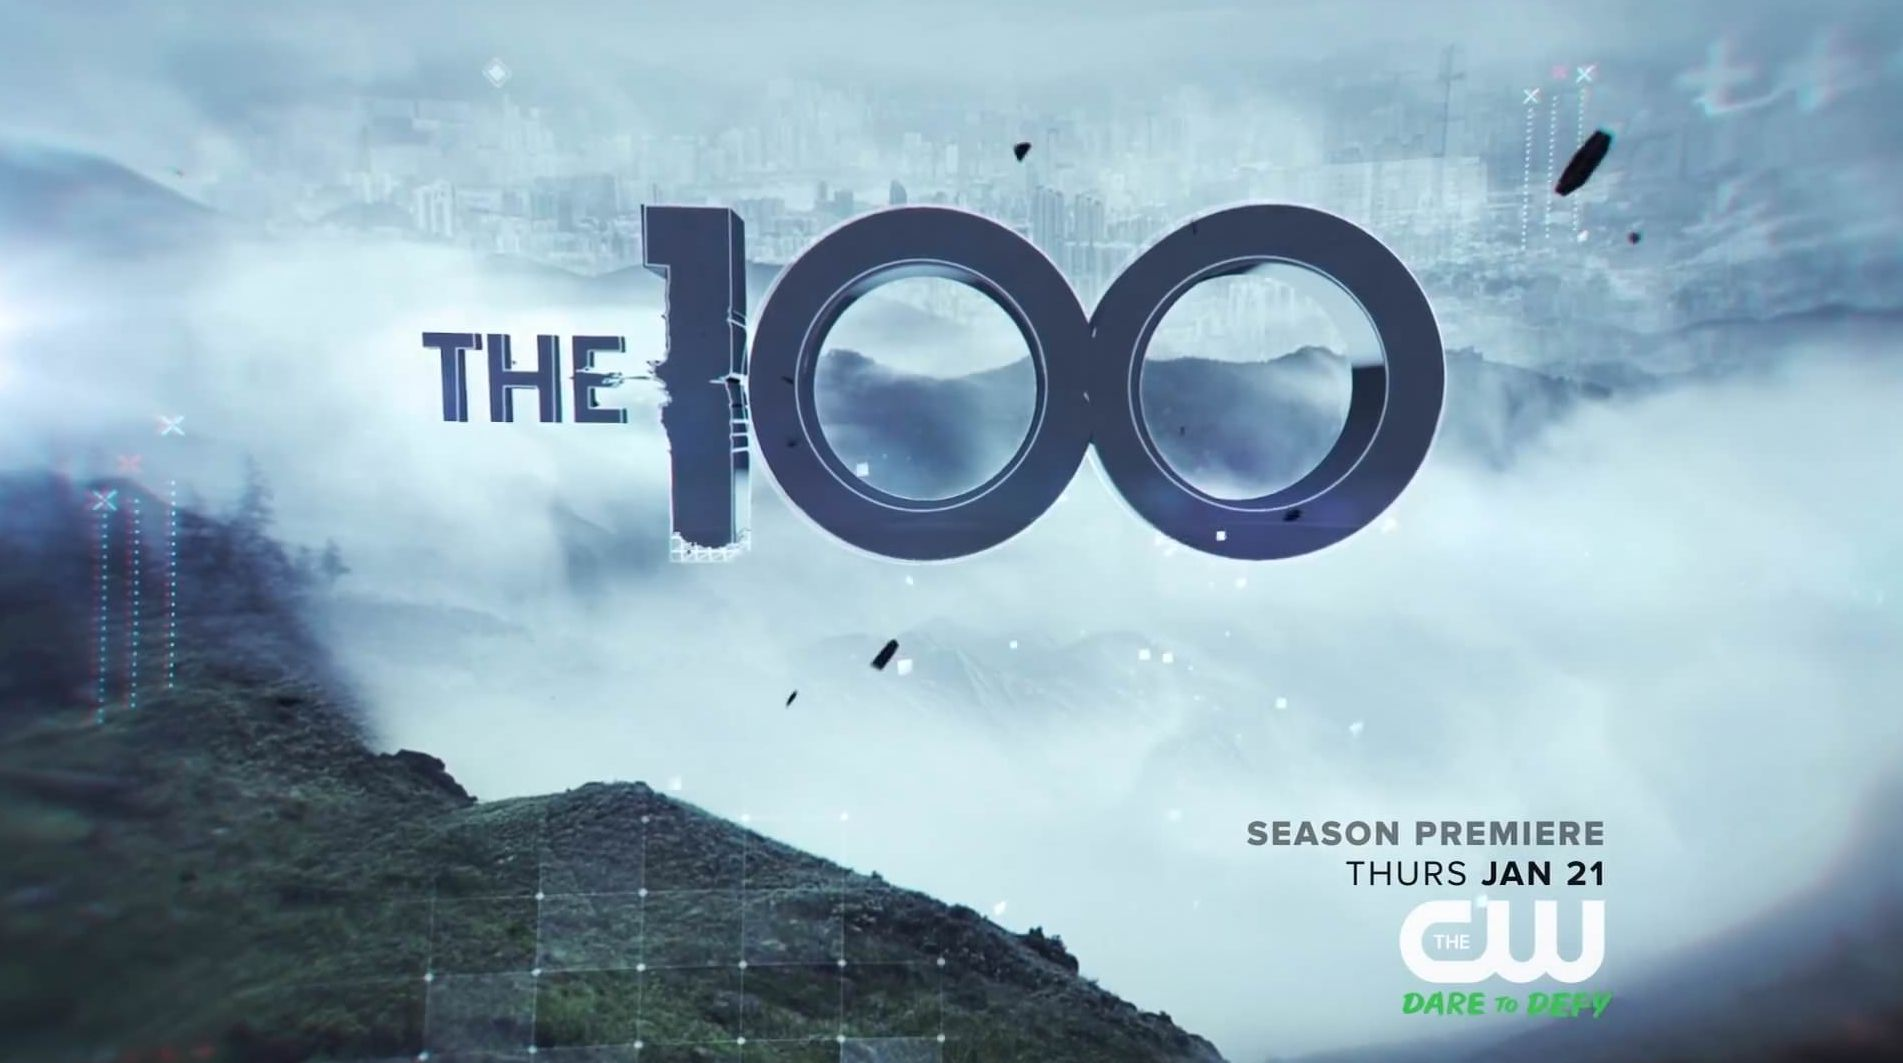 The 100 Season Three title card